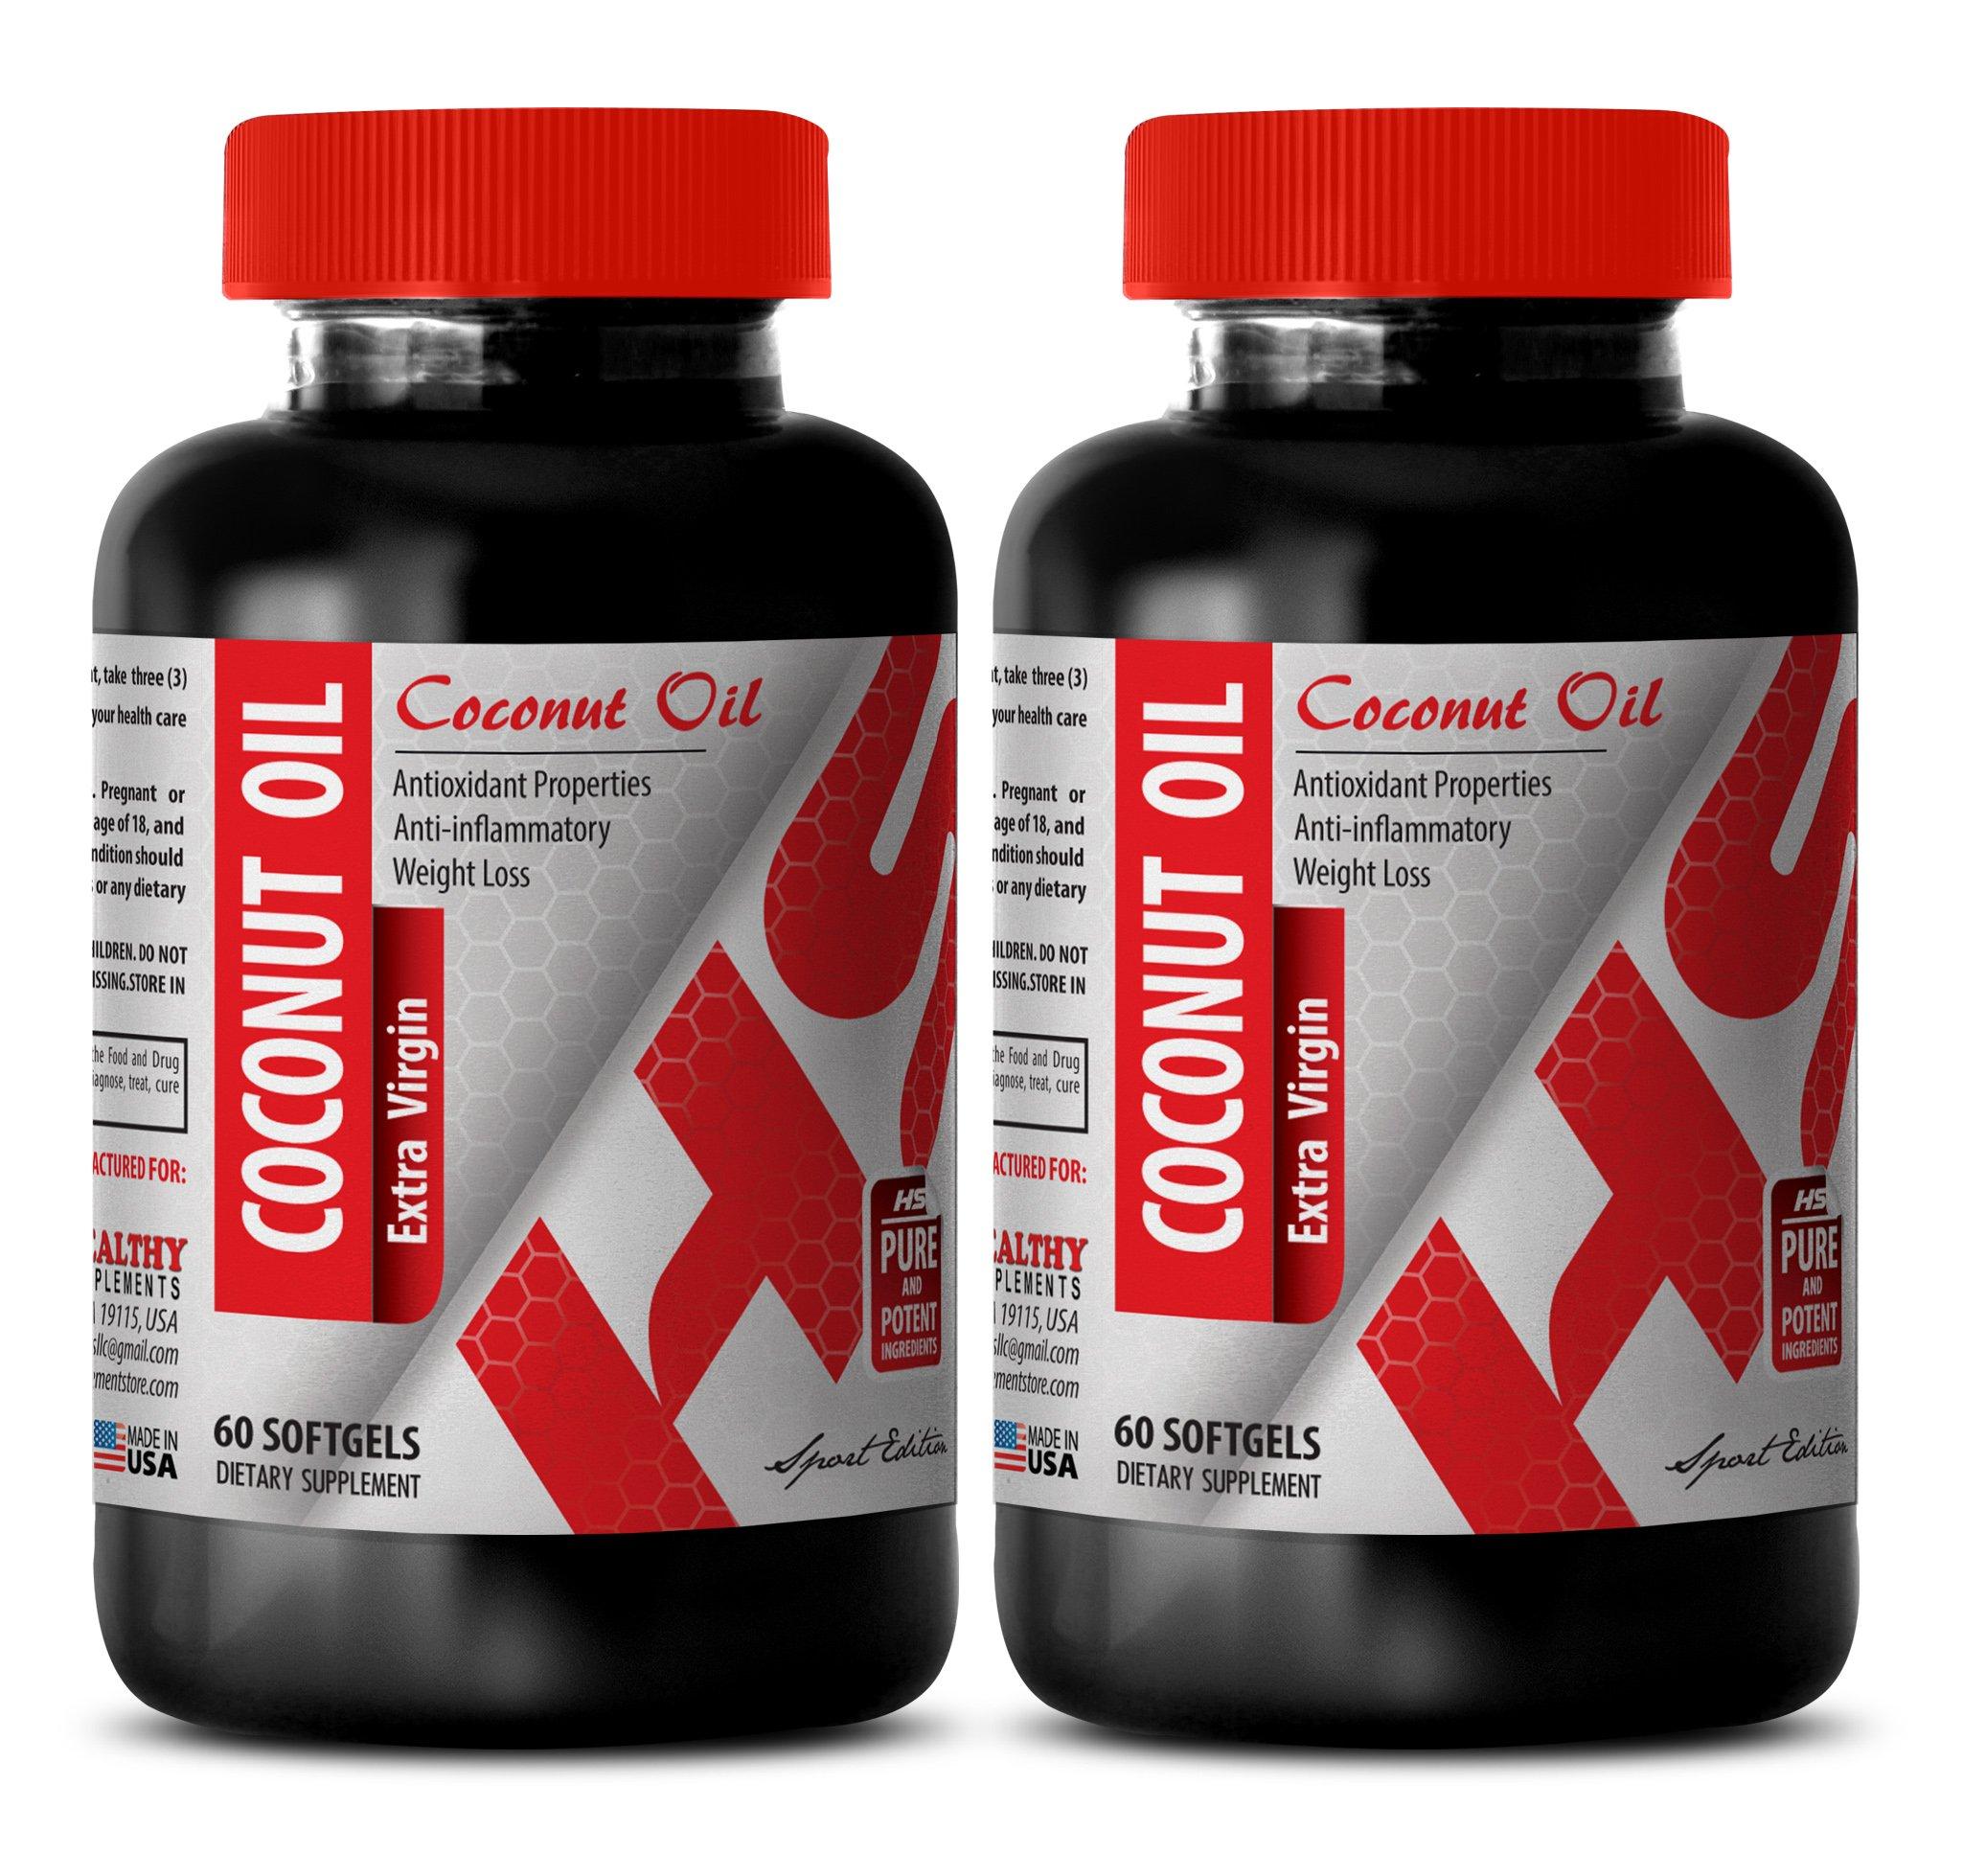 Organic coconut oil capsules extra virgin 1000 mg - PURIFIED COCONUT OIL EXTRA VIRGIN 3000 MG - improve digestion (2 Bottles)